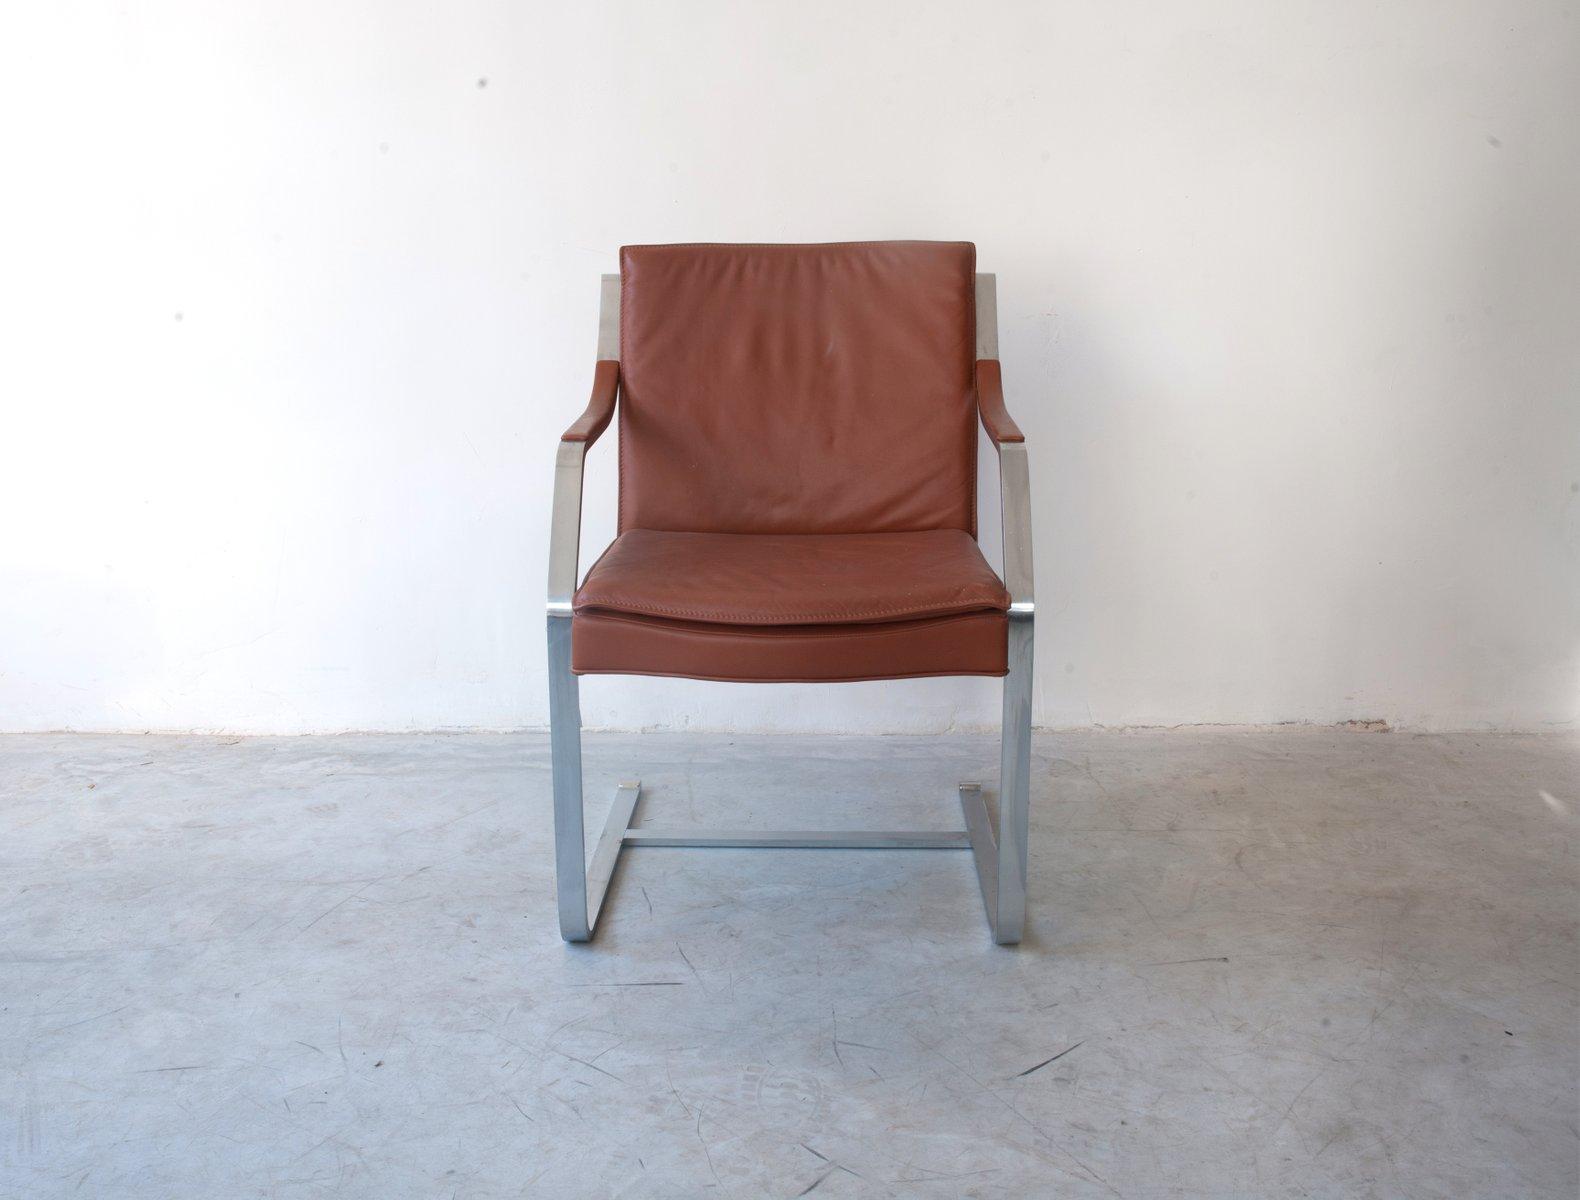 Kamelbrauner Leder Sessel von Rudolf Bernd Glatzel für Walter Knoll, 1...